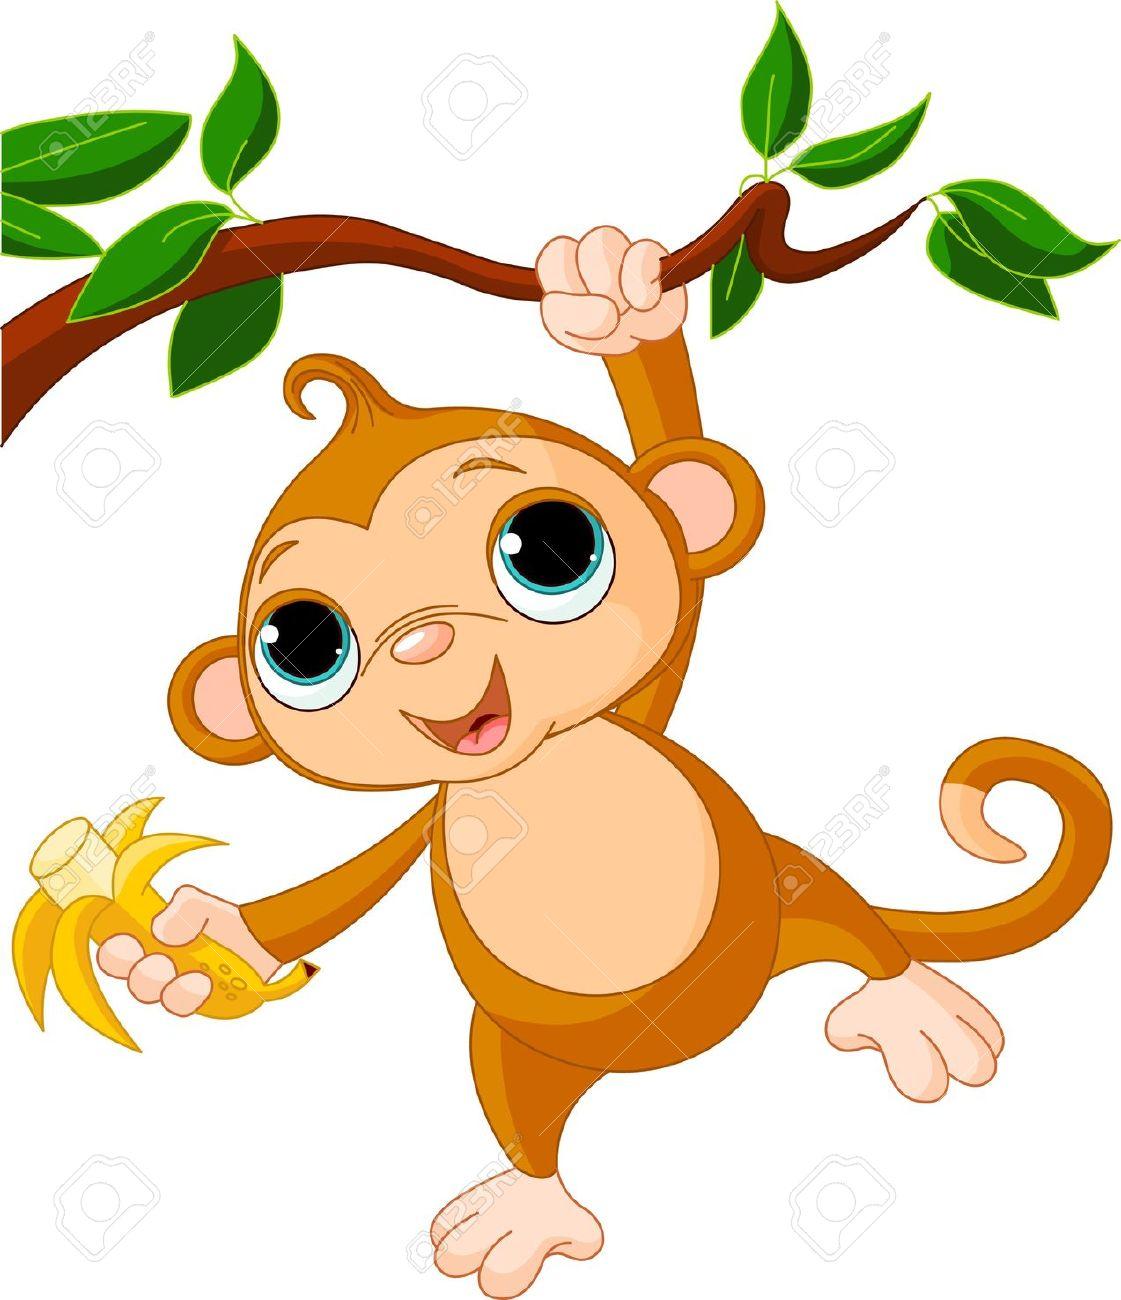 1121x1300 Cute Baby Monkey On A Tree Holding Banana Royalty Free Cliparts